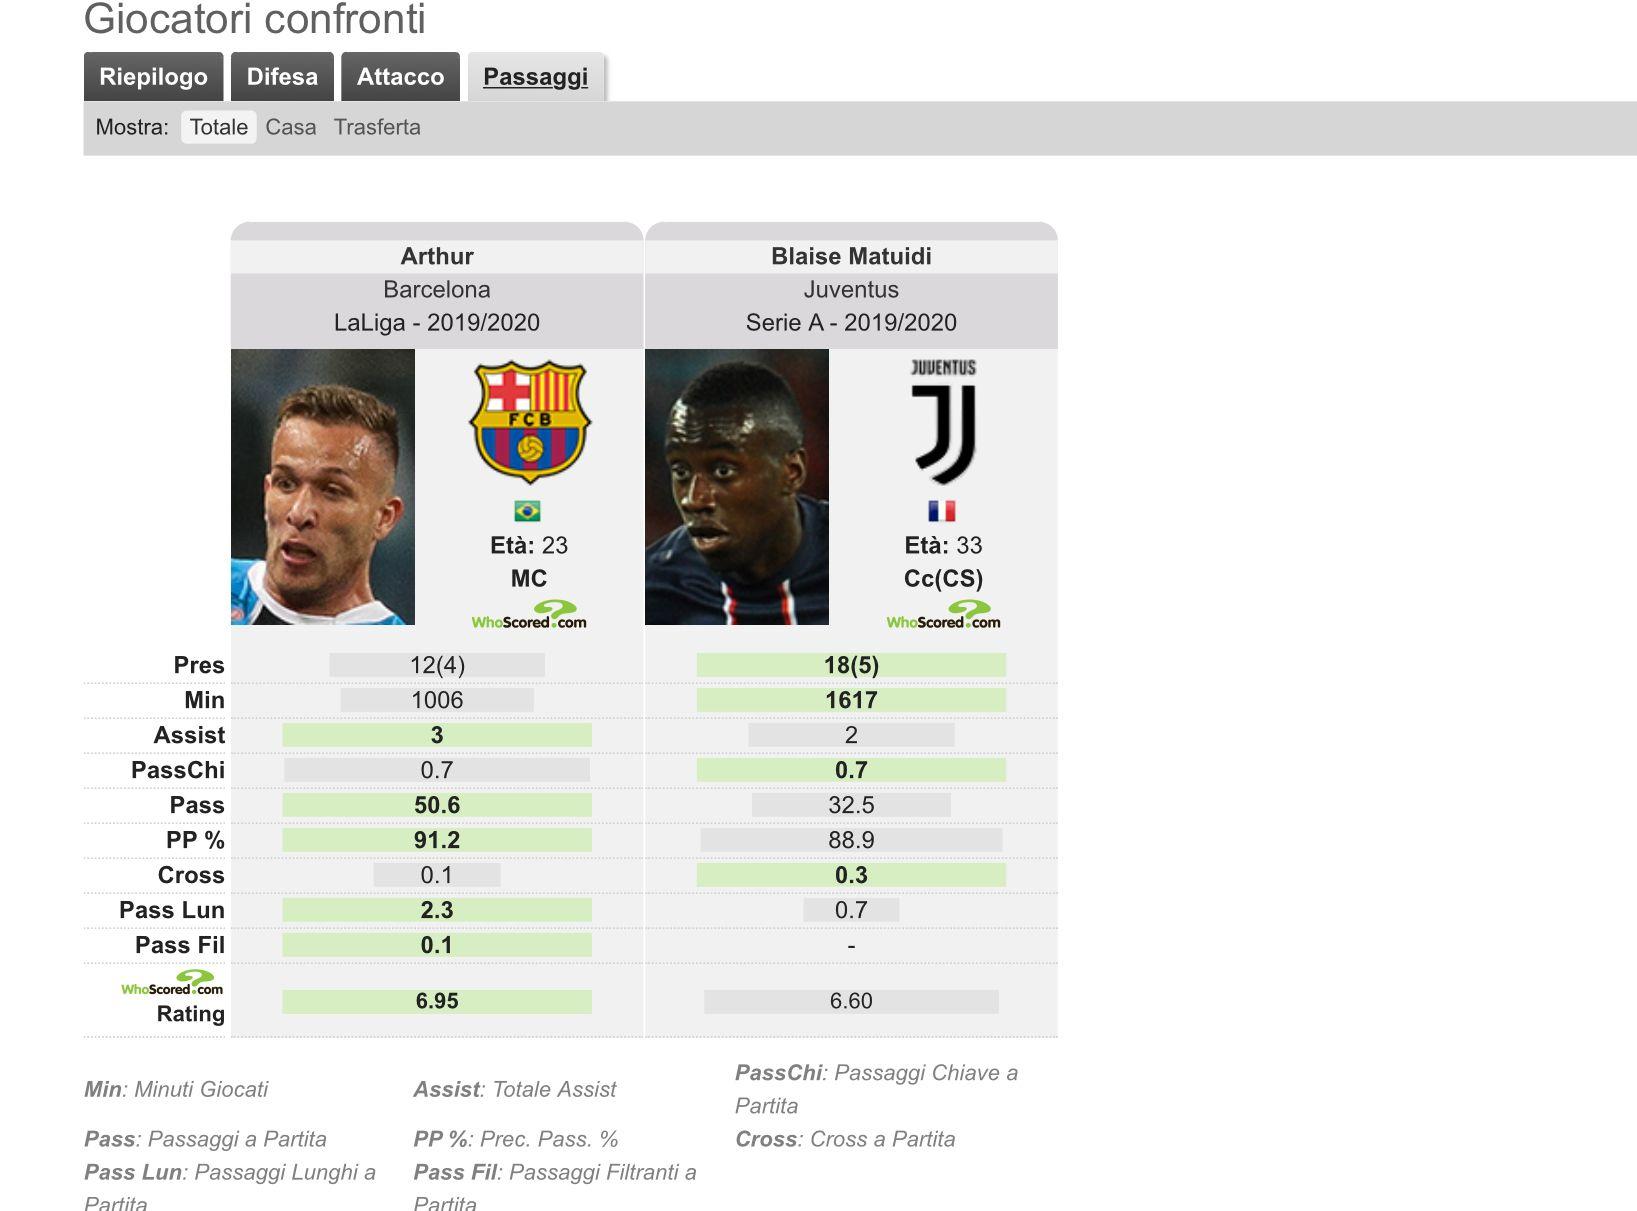 Calciomercato Juventus, Pjanic al Barcellona: accordo raggiunto